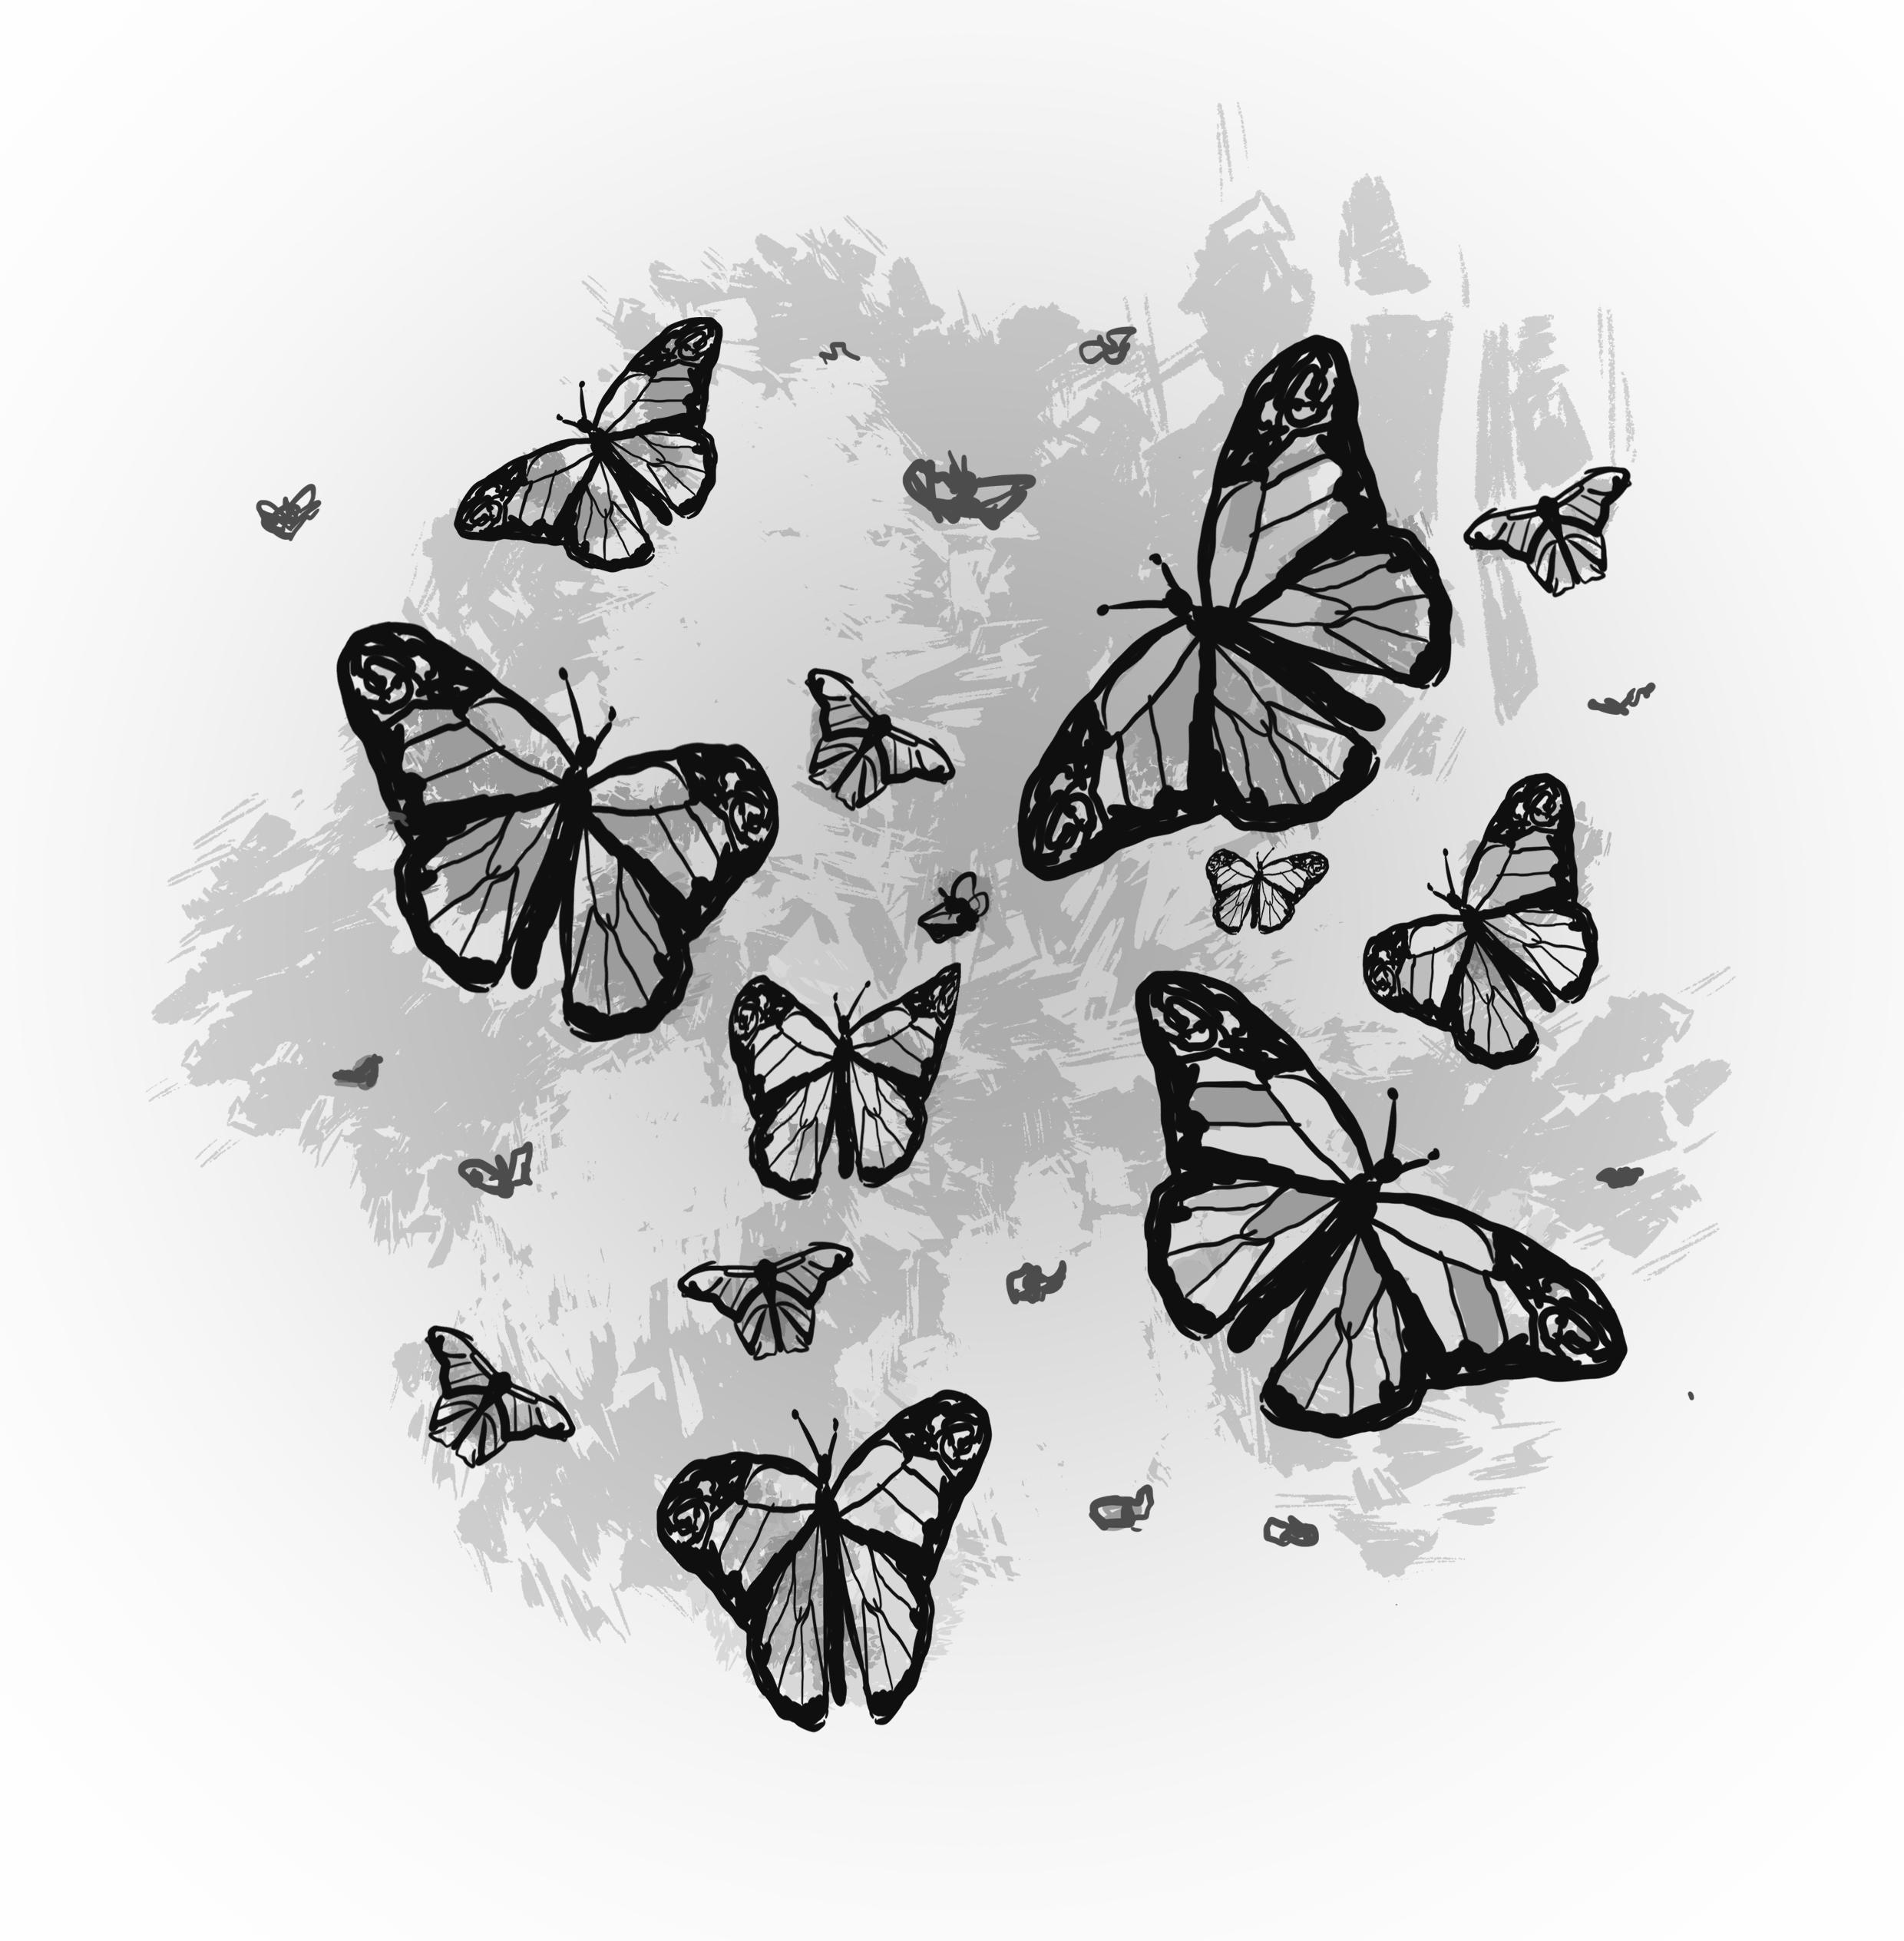 black ink illustration of butterflies